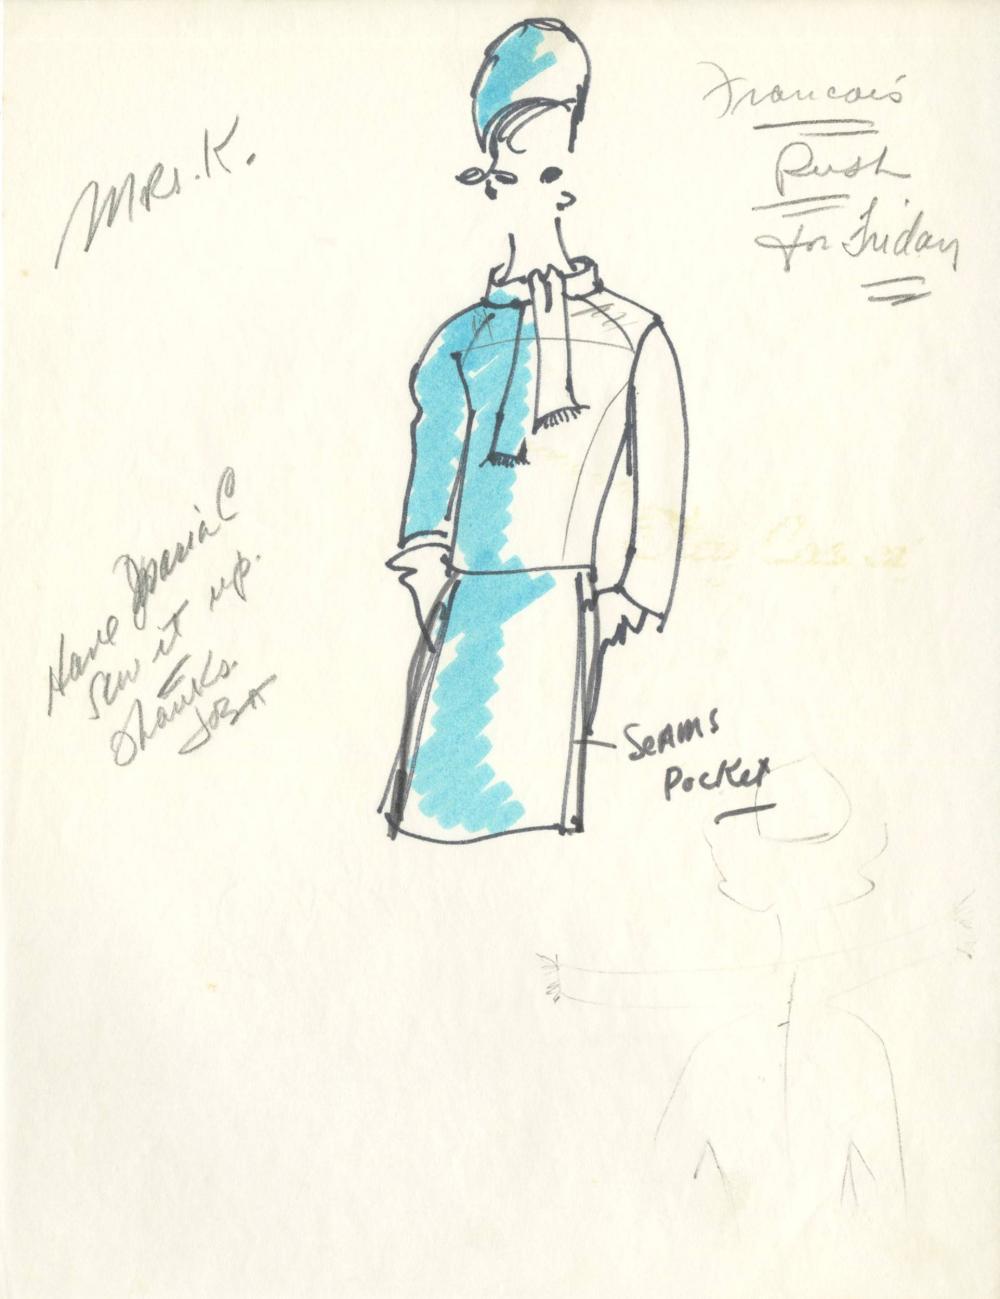 Jackie Kennedy's Oleg Cassini Designed Blue Suit, Original Fashion Sketch